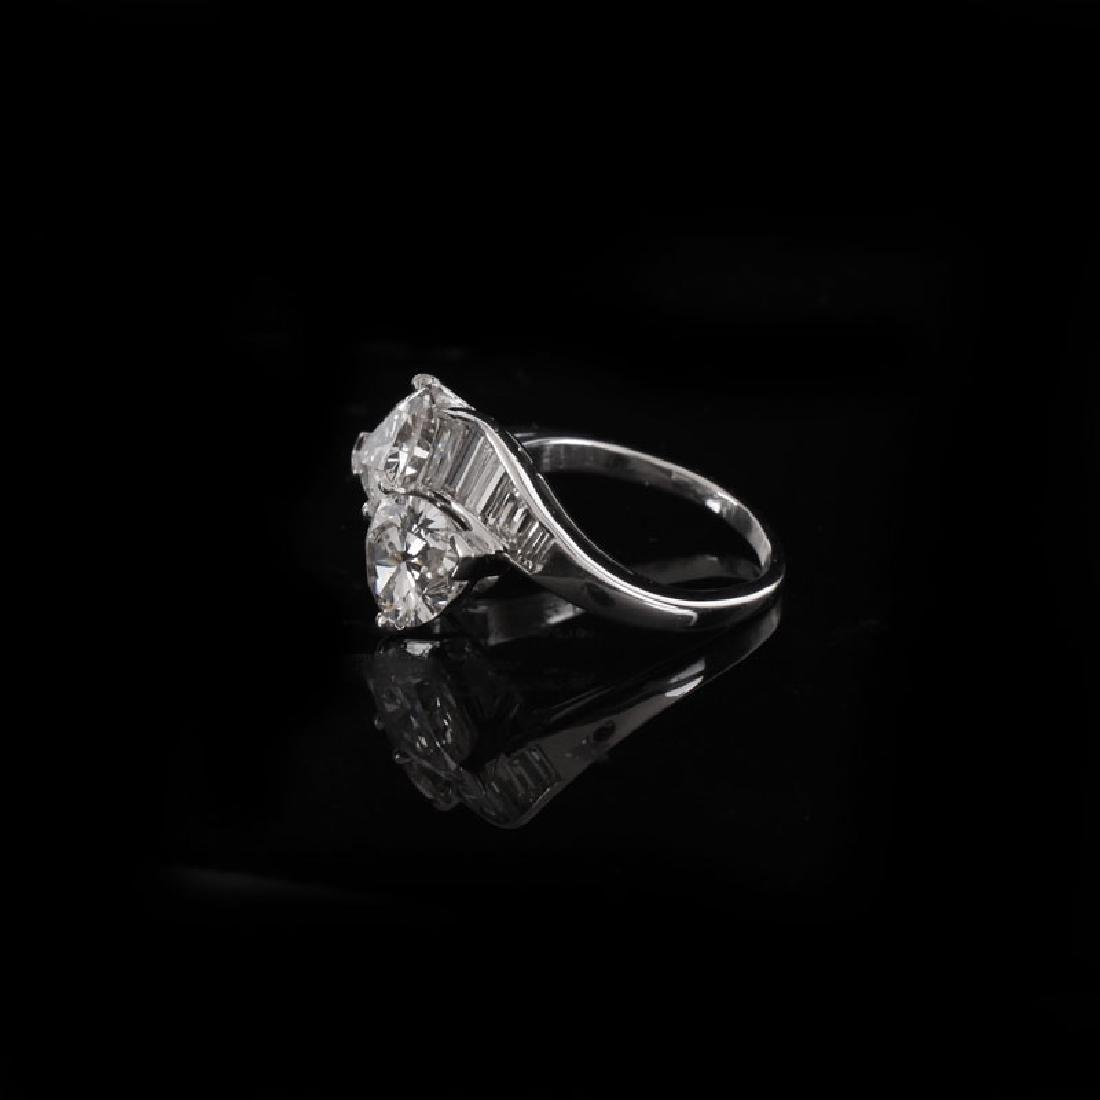 Vintage Approx. 1.47 Carat Pear Shape Diamond, 1.22 - 2